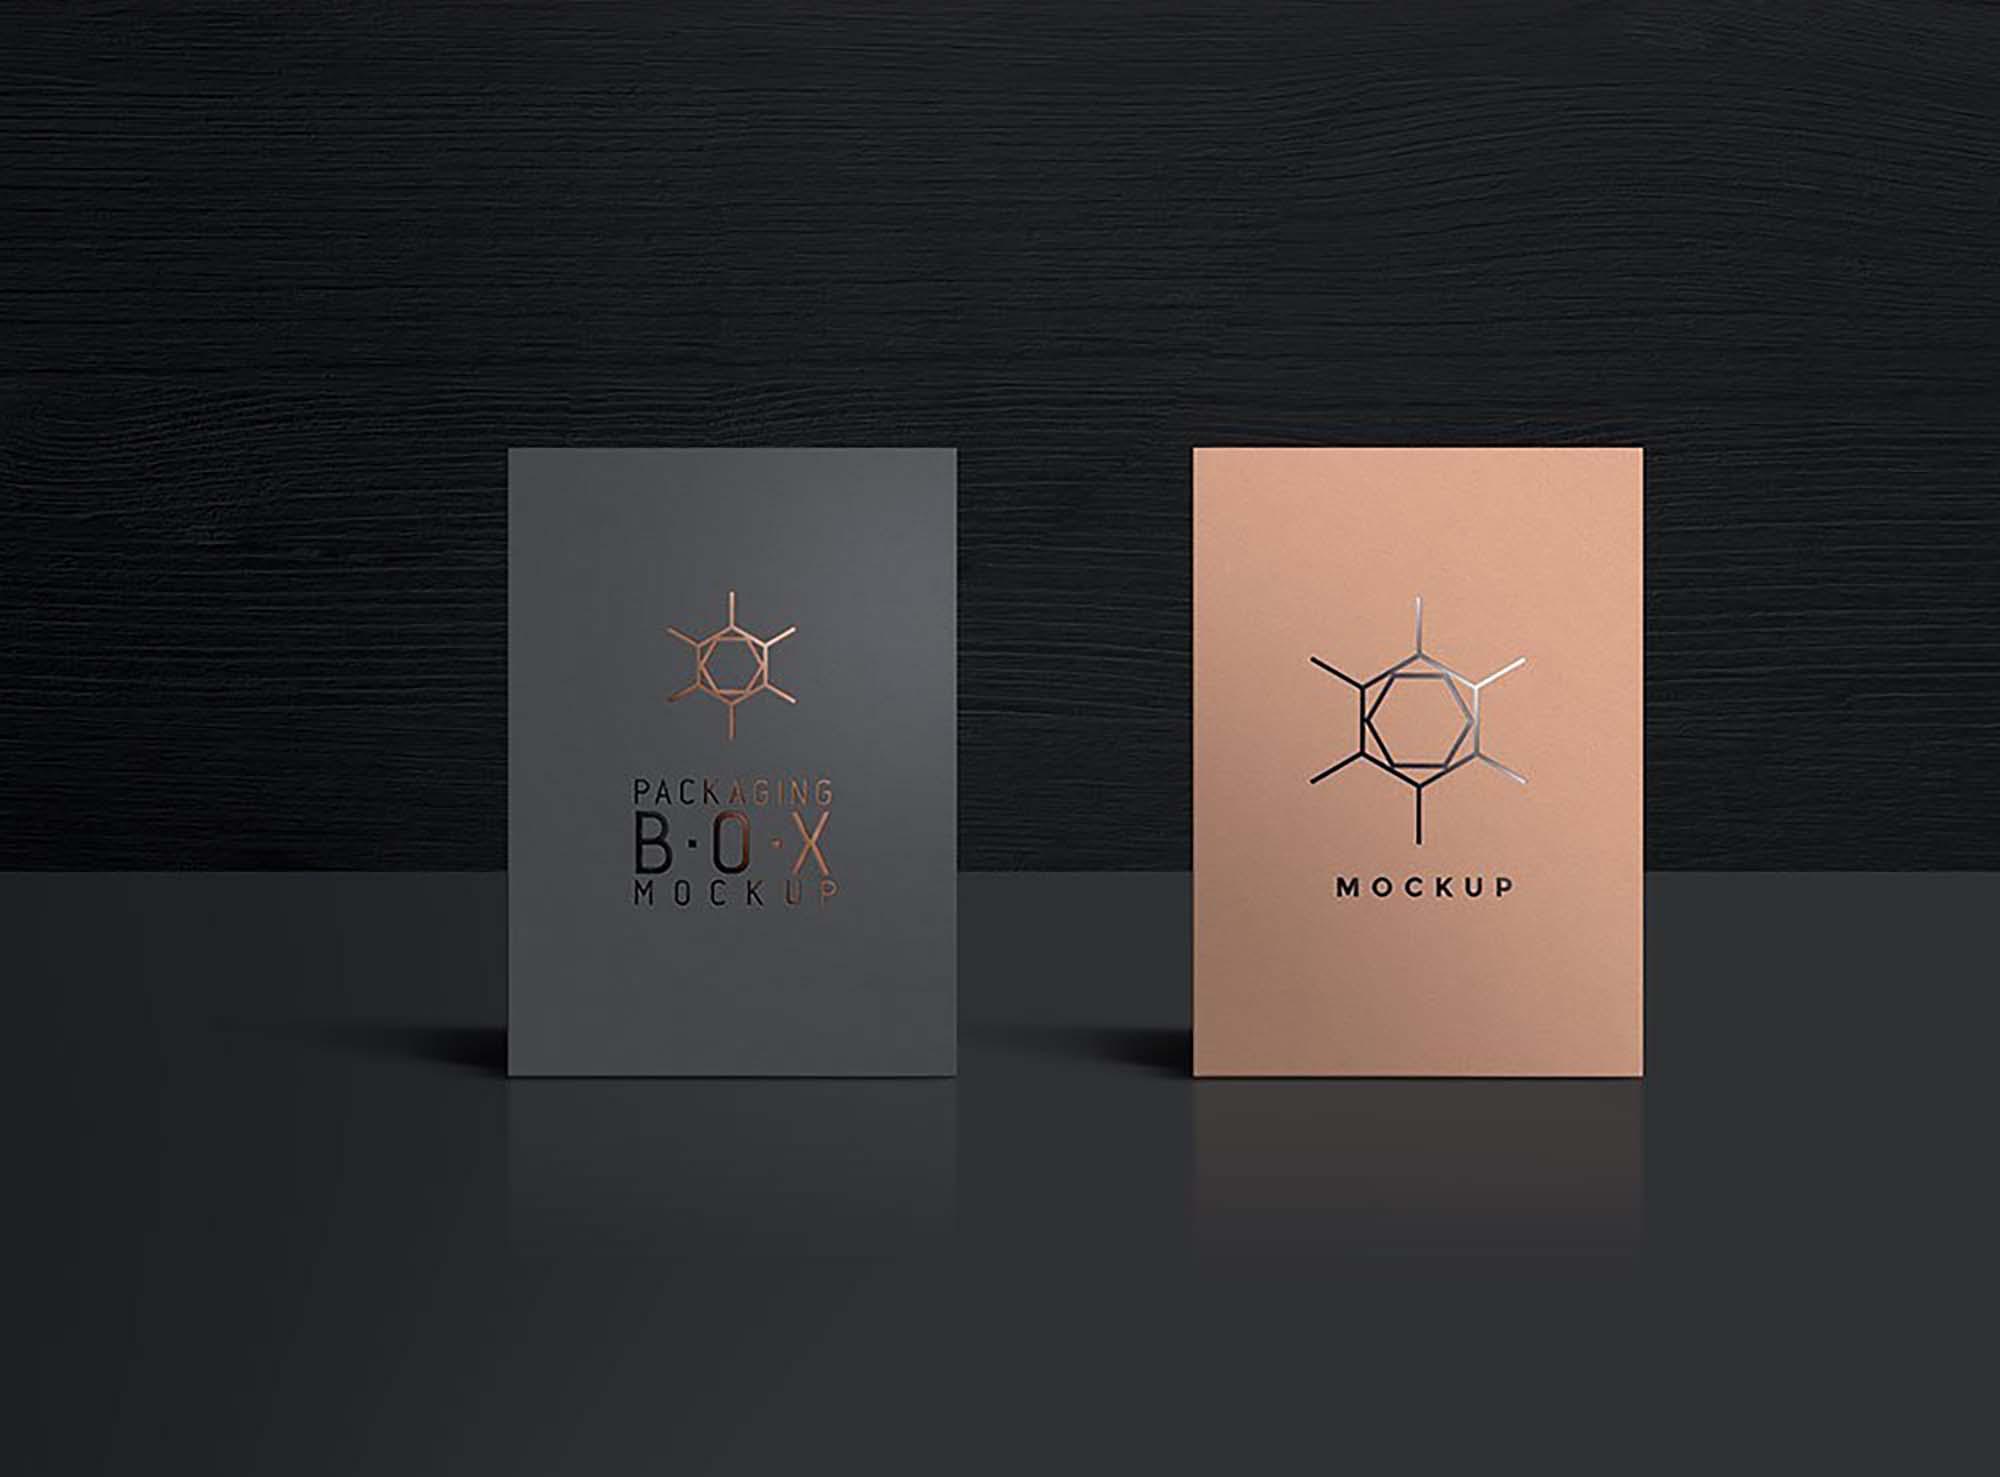 Packaging Product Box Mockup 3